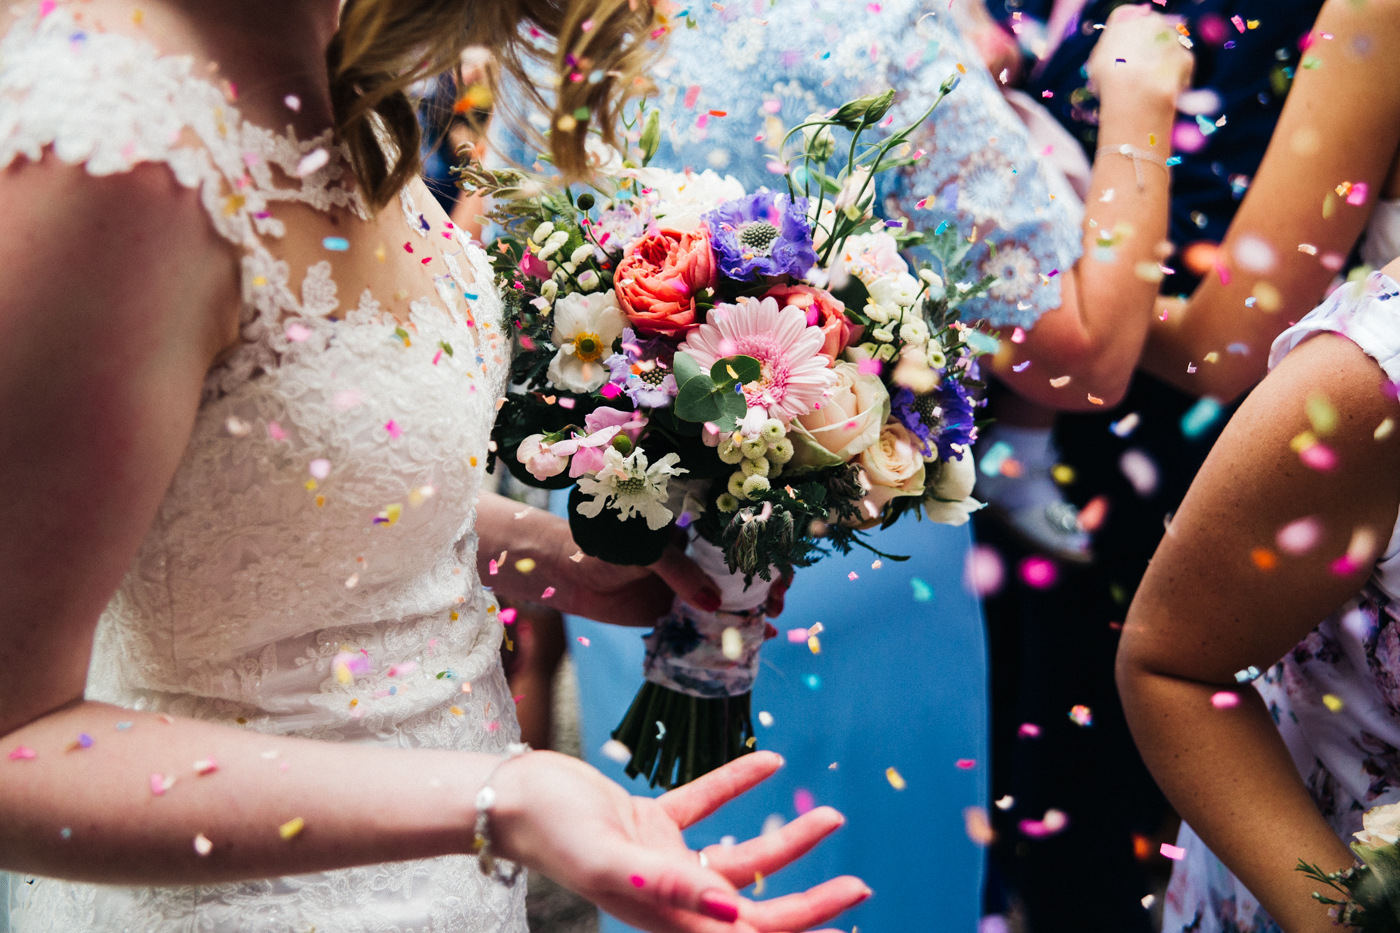 teesside-middlesbrough-north-east-wedding-photographer-creative-wedding-venues-0019.jpg